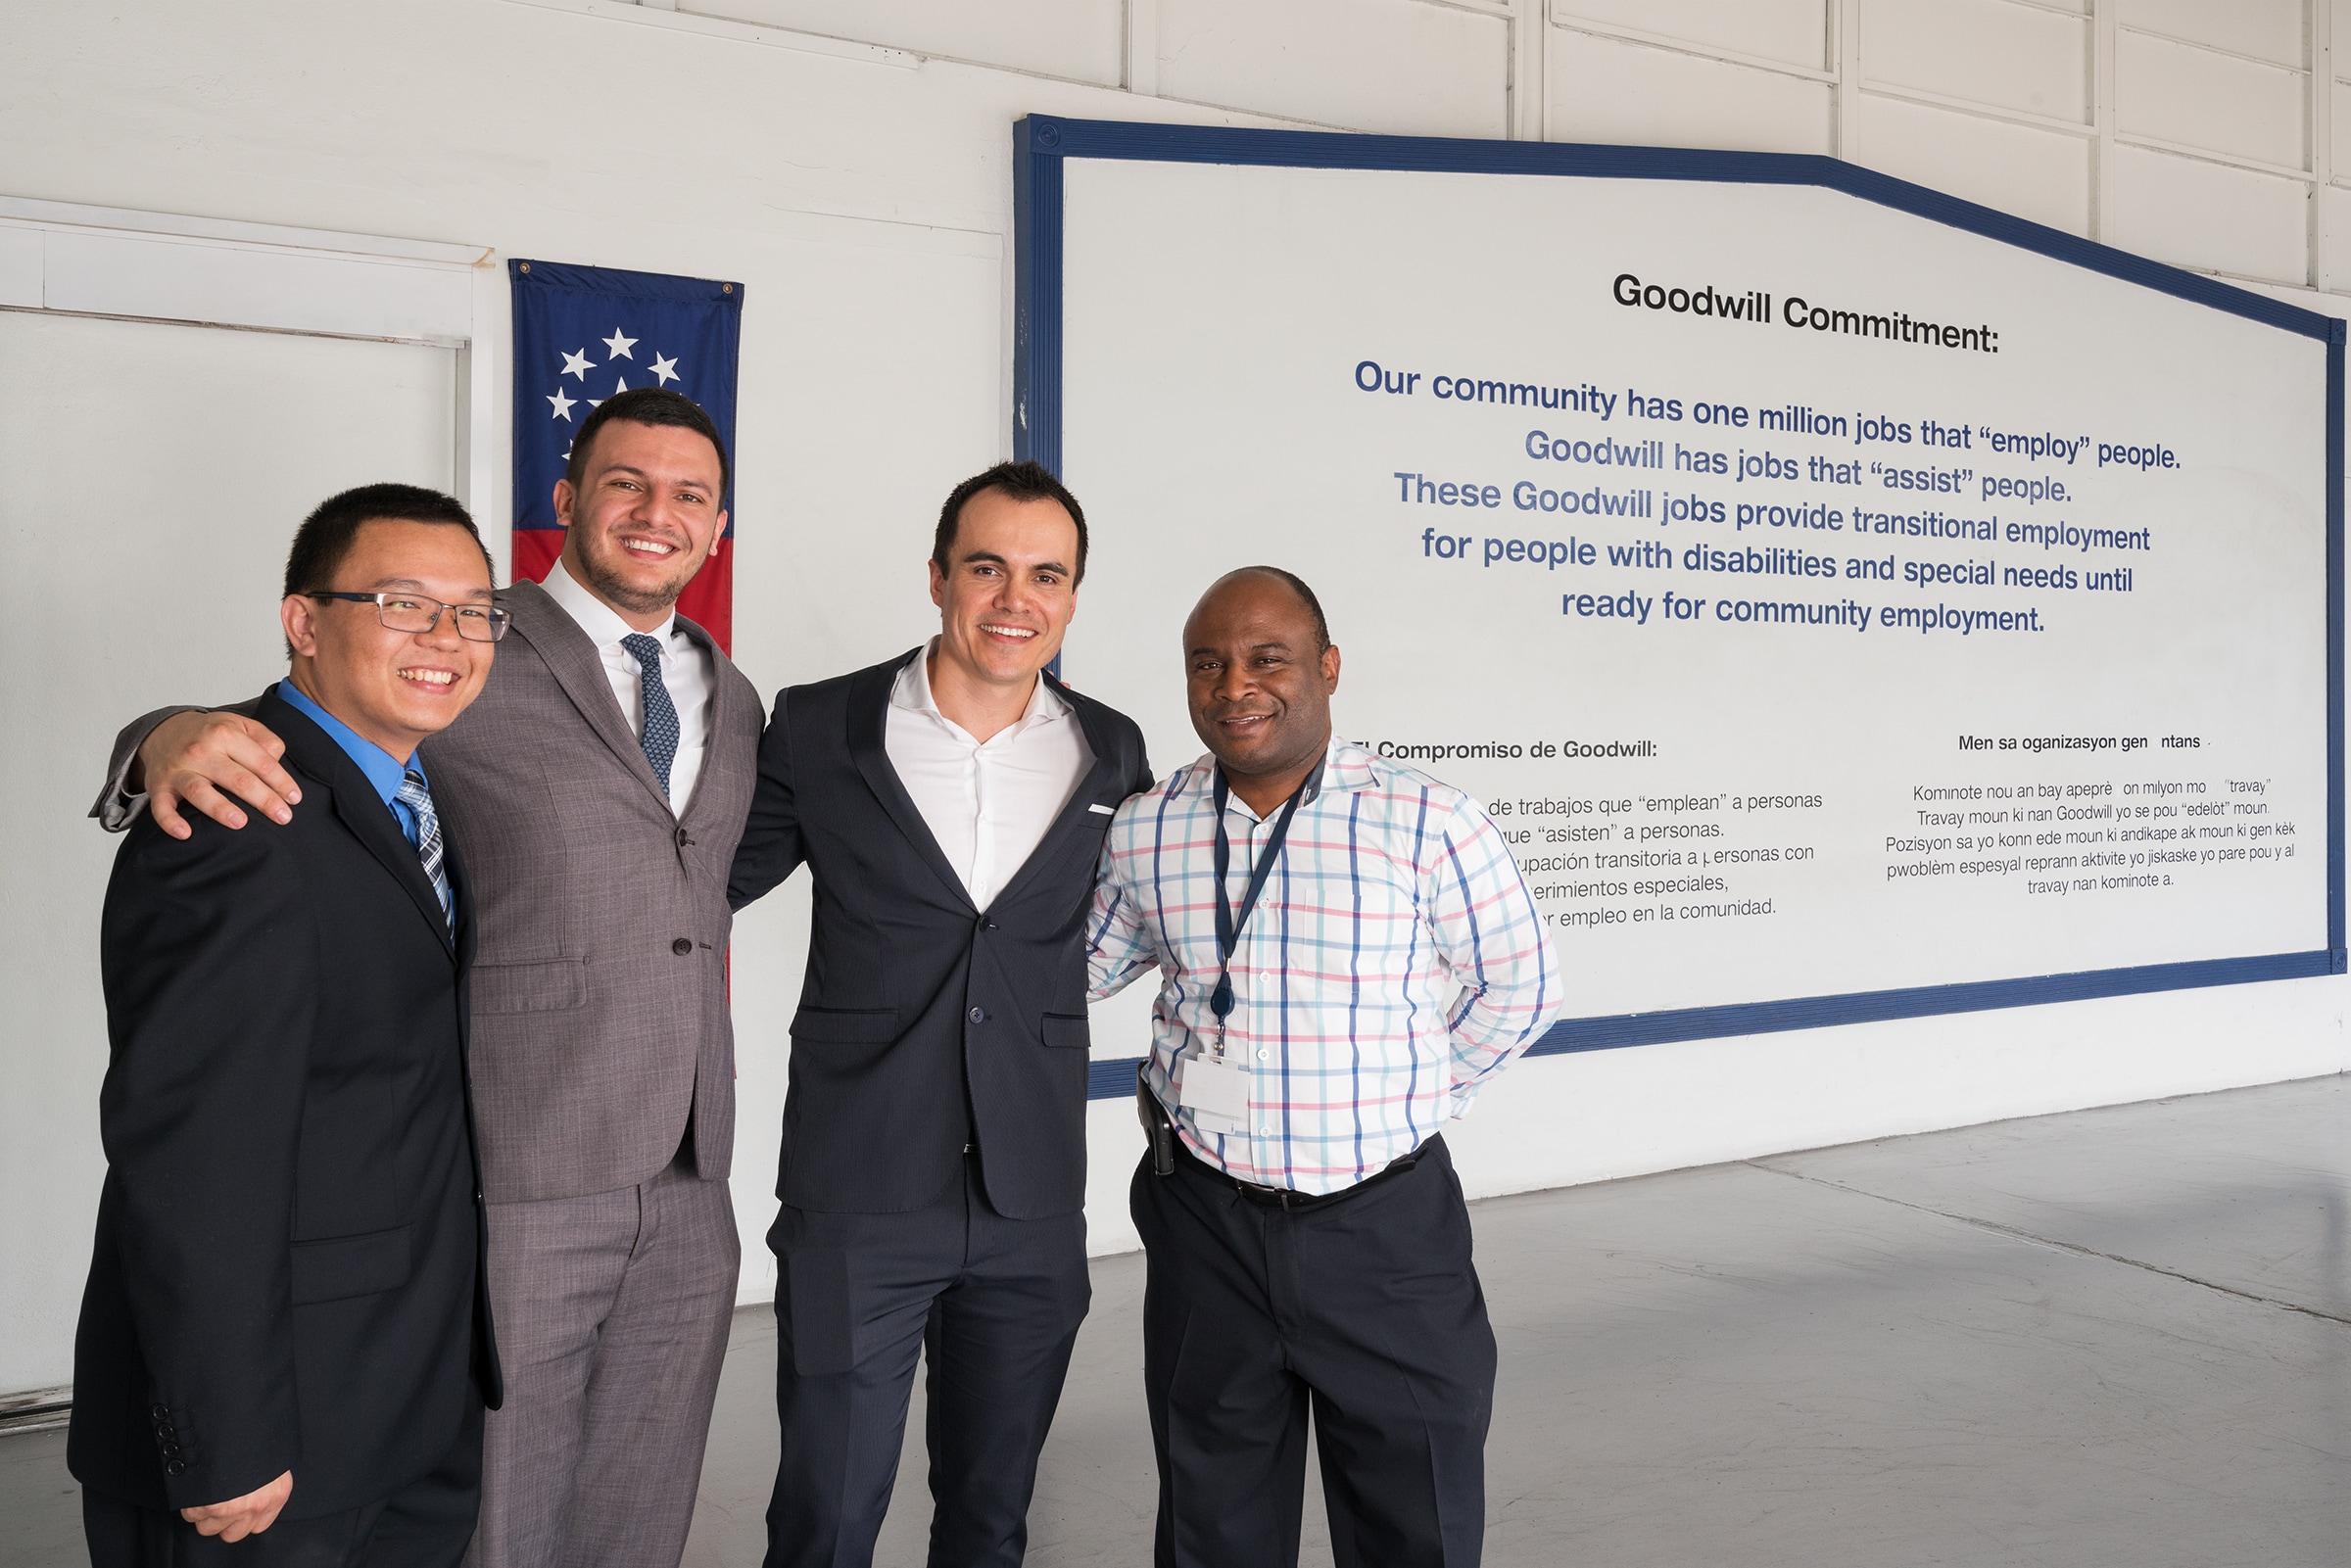 From left to right: Zuo Wang, Engineer at Soutec, Pedro Colmenares, Account Executive at Soutec, Julian Pinzon, Managing Director at Soutec, Sam Robinson, IT Manager at Goodwill of South Florida.